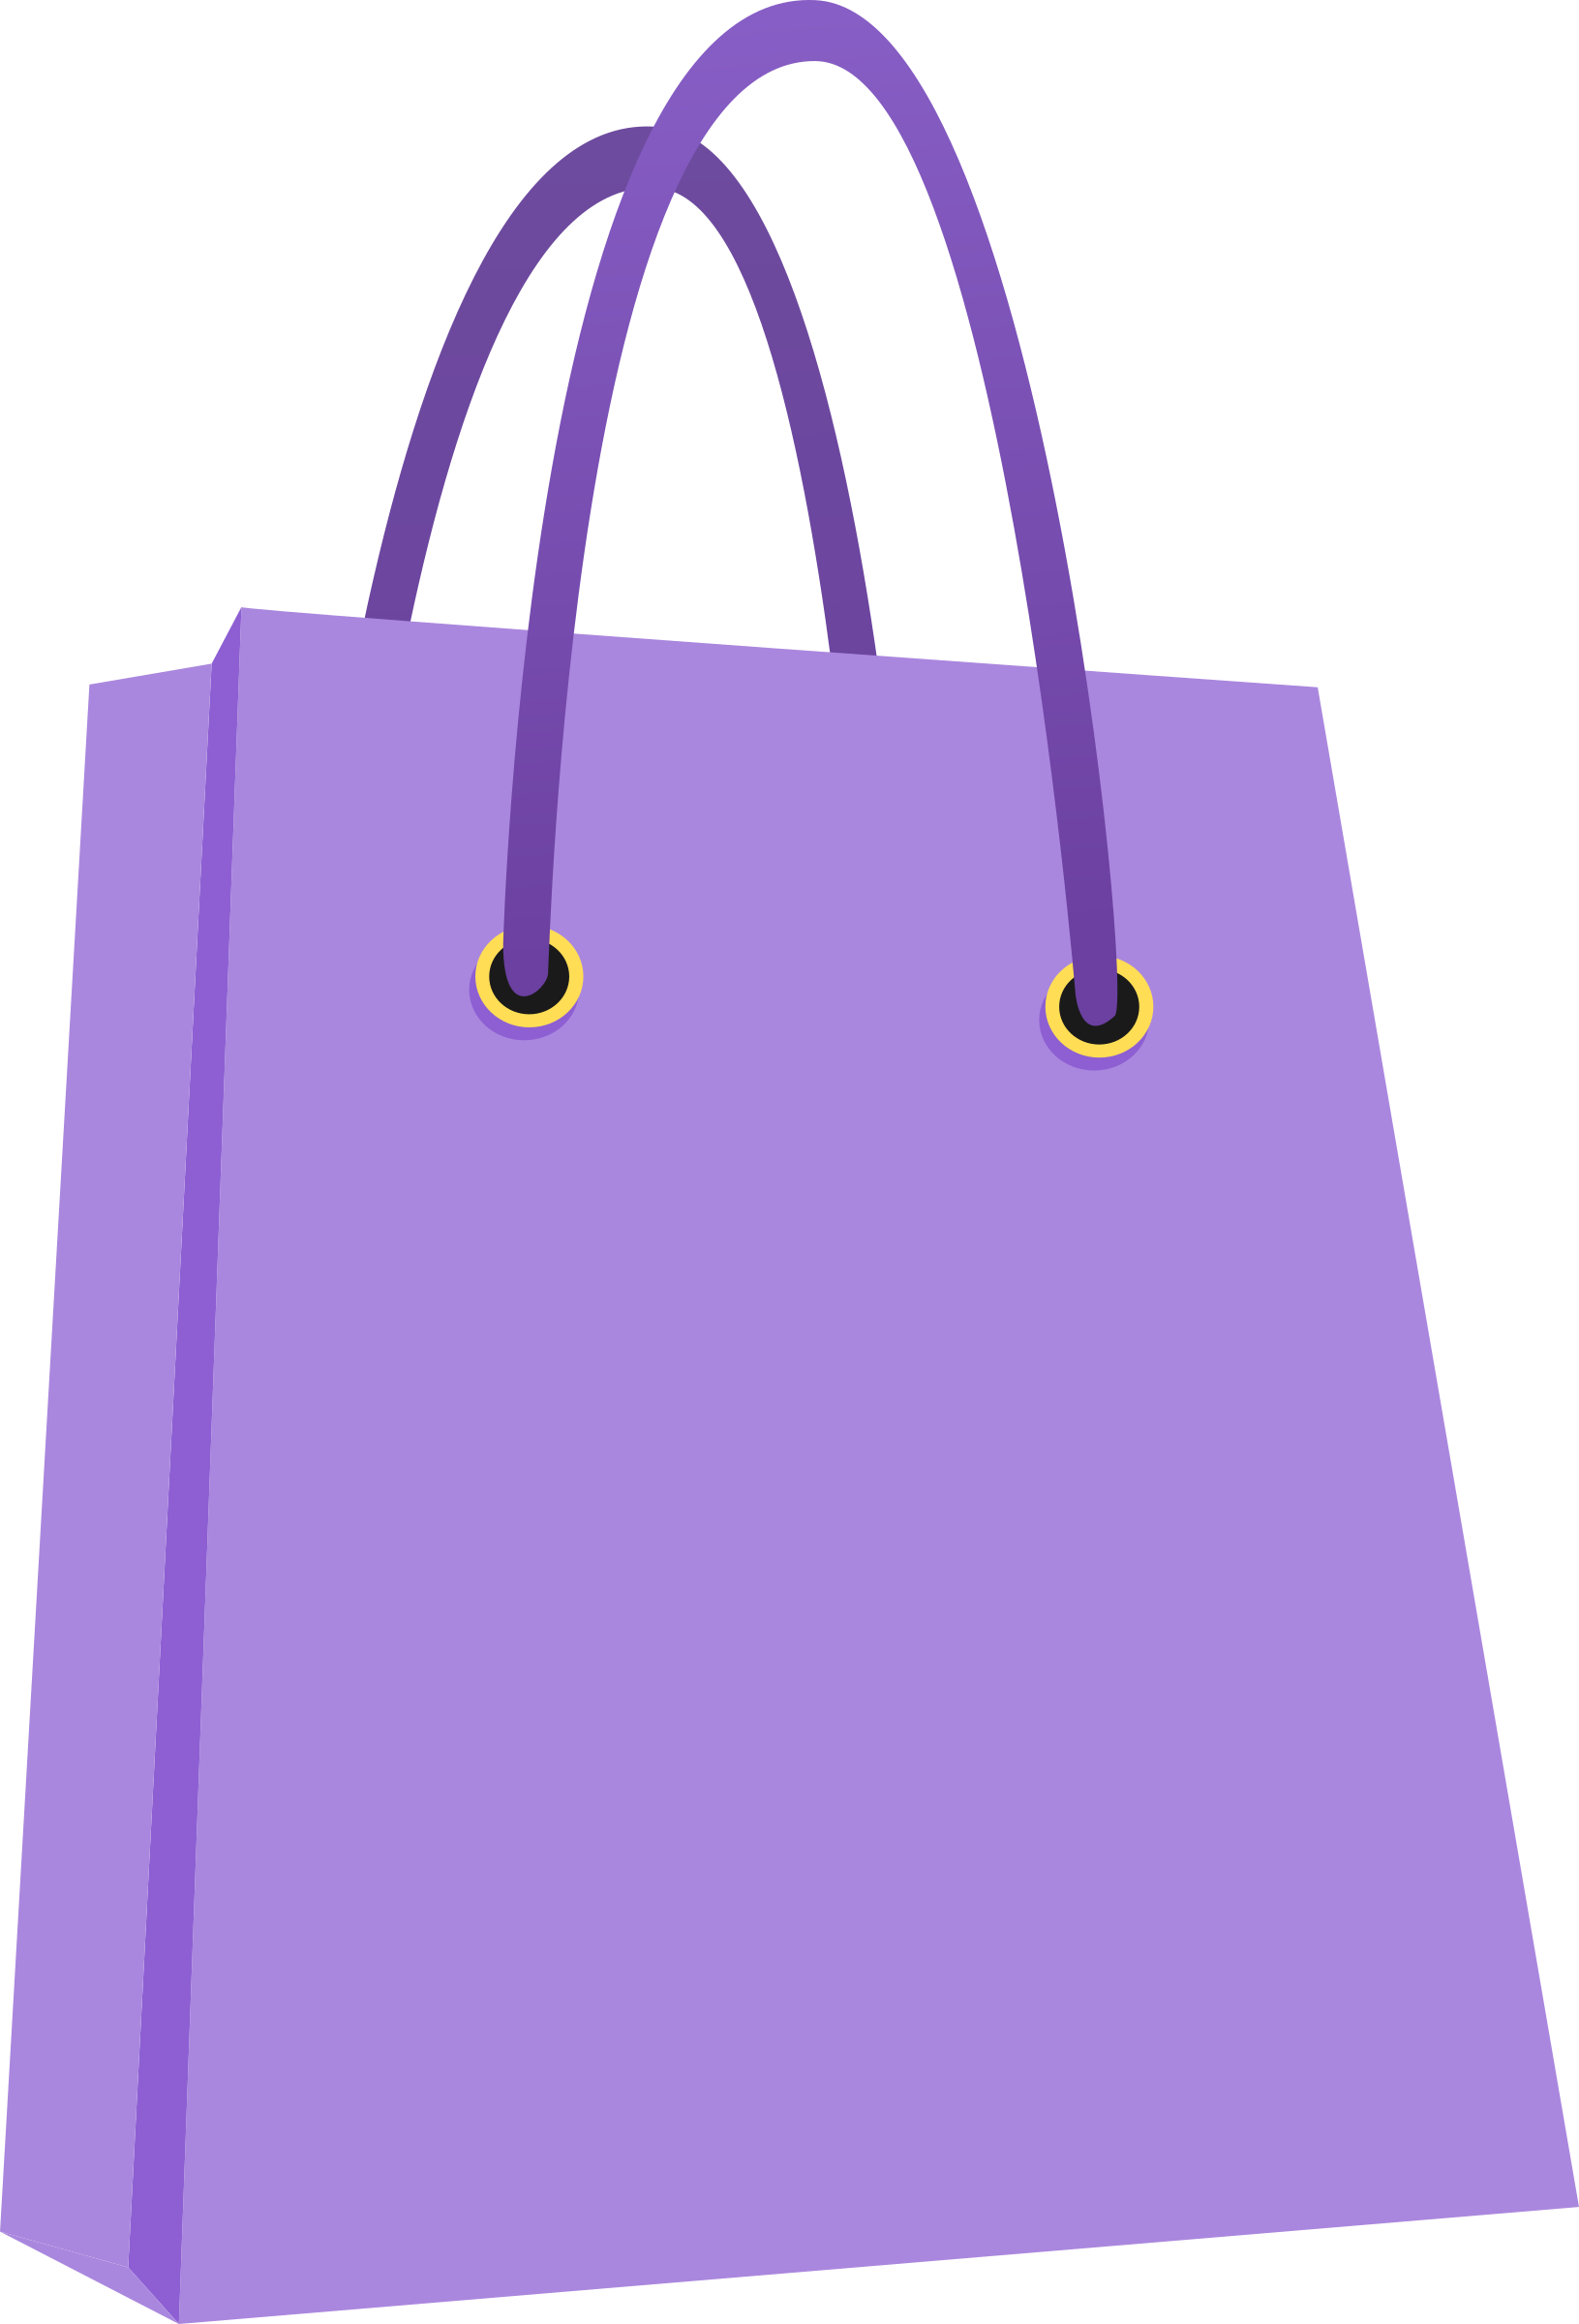 Christmas shopping bag clipart svg freeuse Tote bag Shopping Bags & Trolleys Clip art - shopping clipart 1631 ... svg freeuse